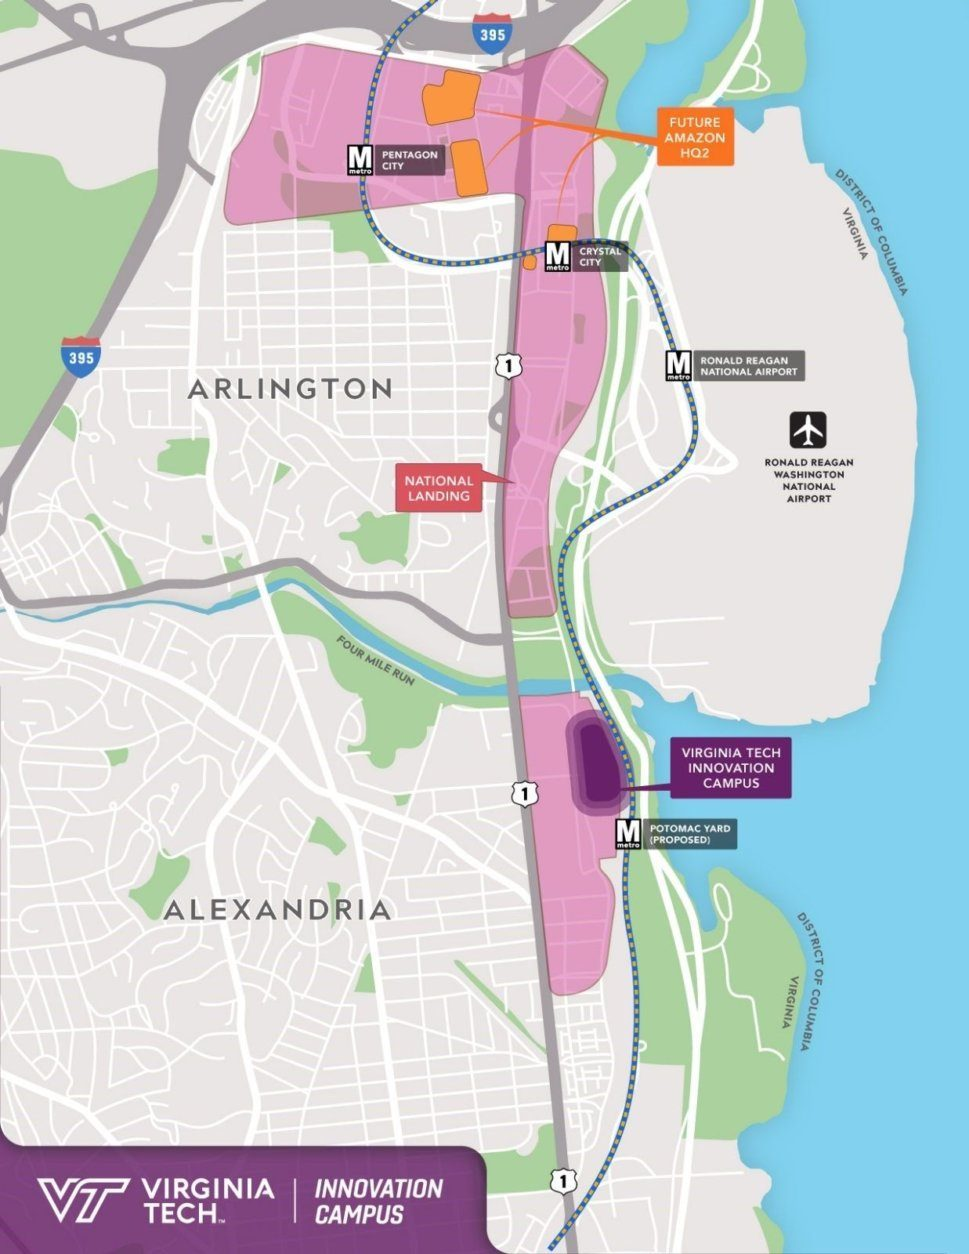 The location of the new Virginia Tech campus in Alexandria. (Courtesy Virginia Tech)